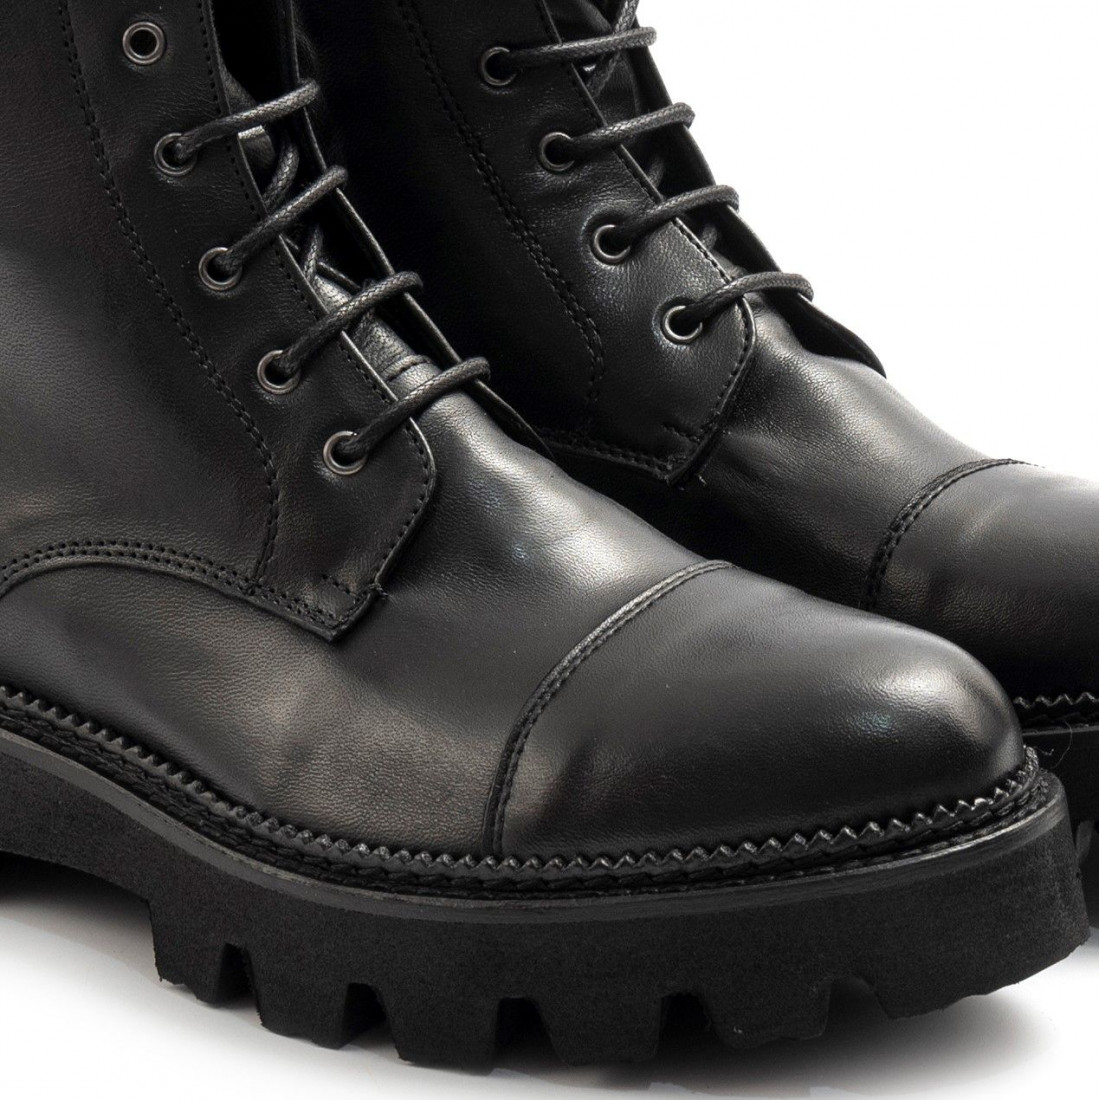 military boots woman sangiorgio d507softy nero 7861